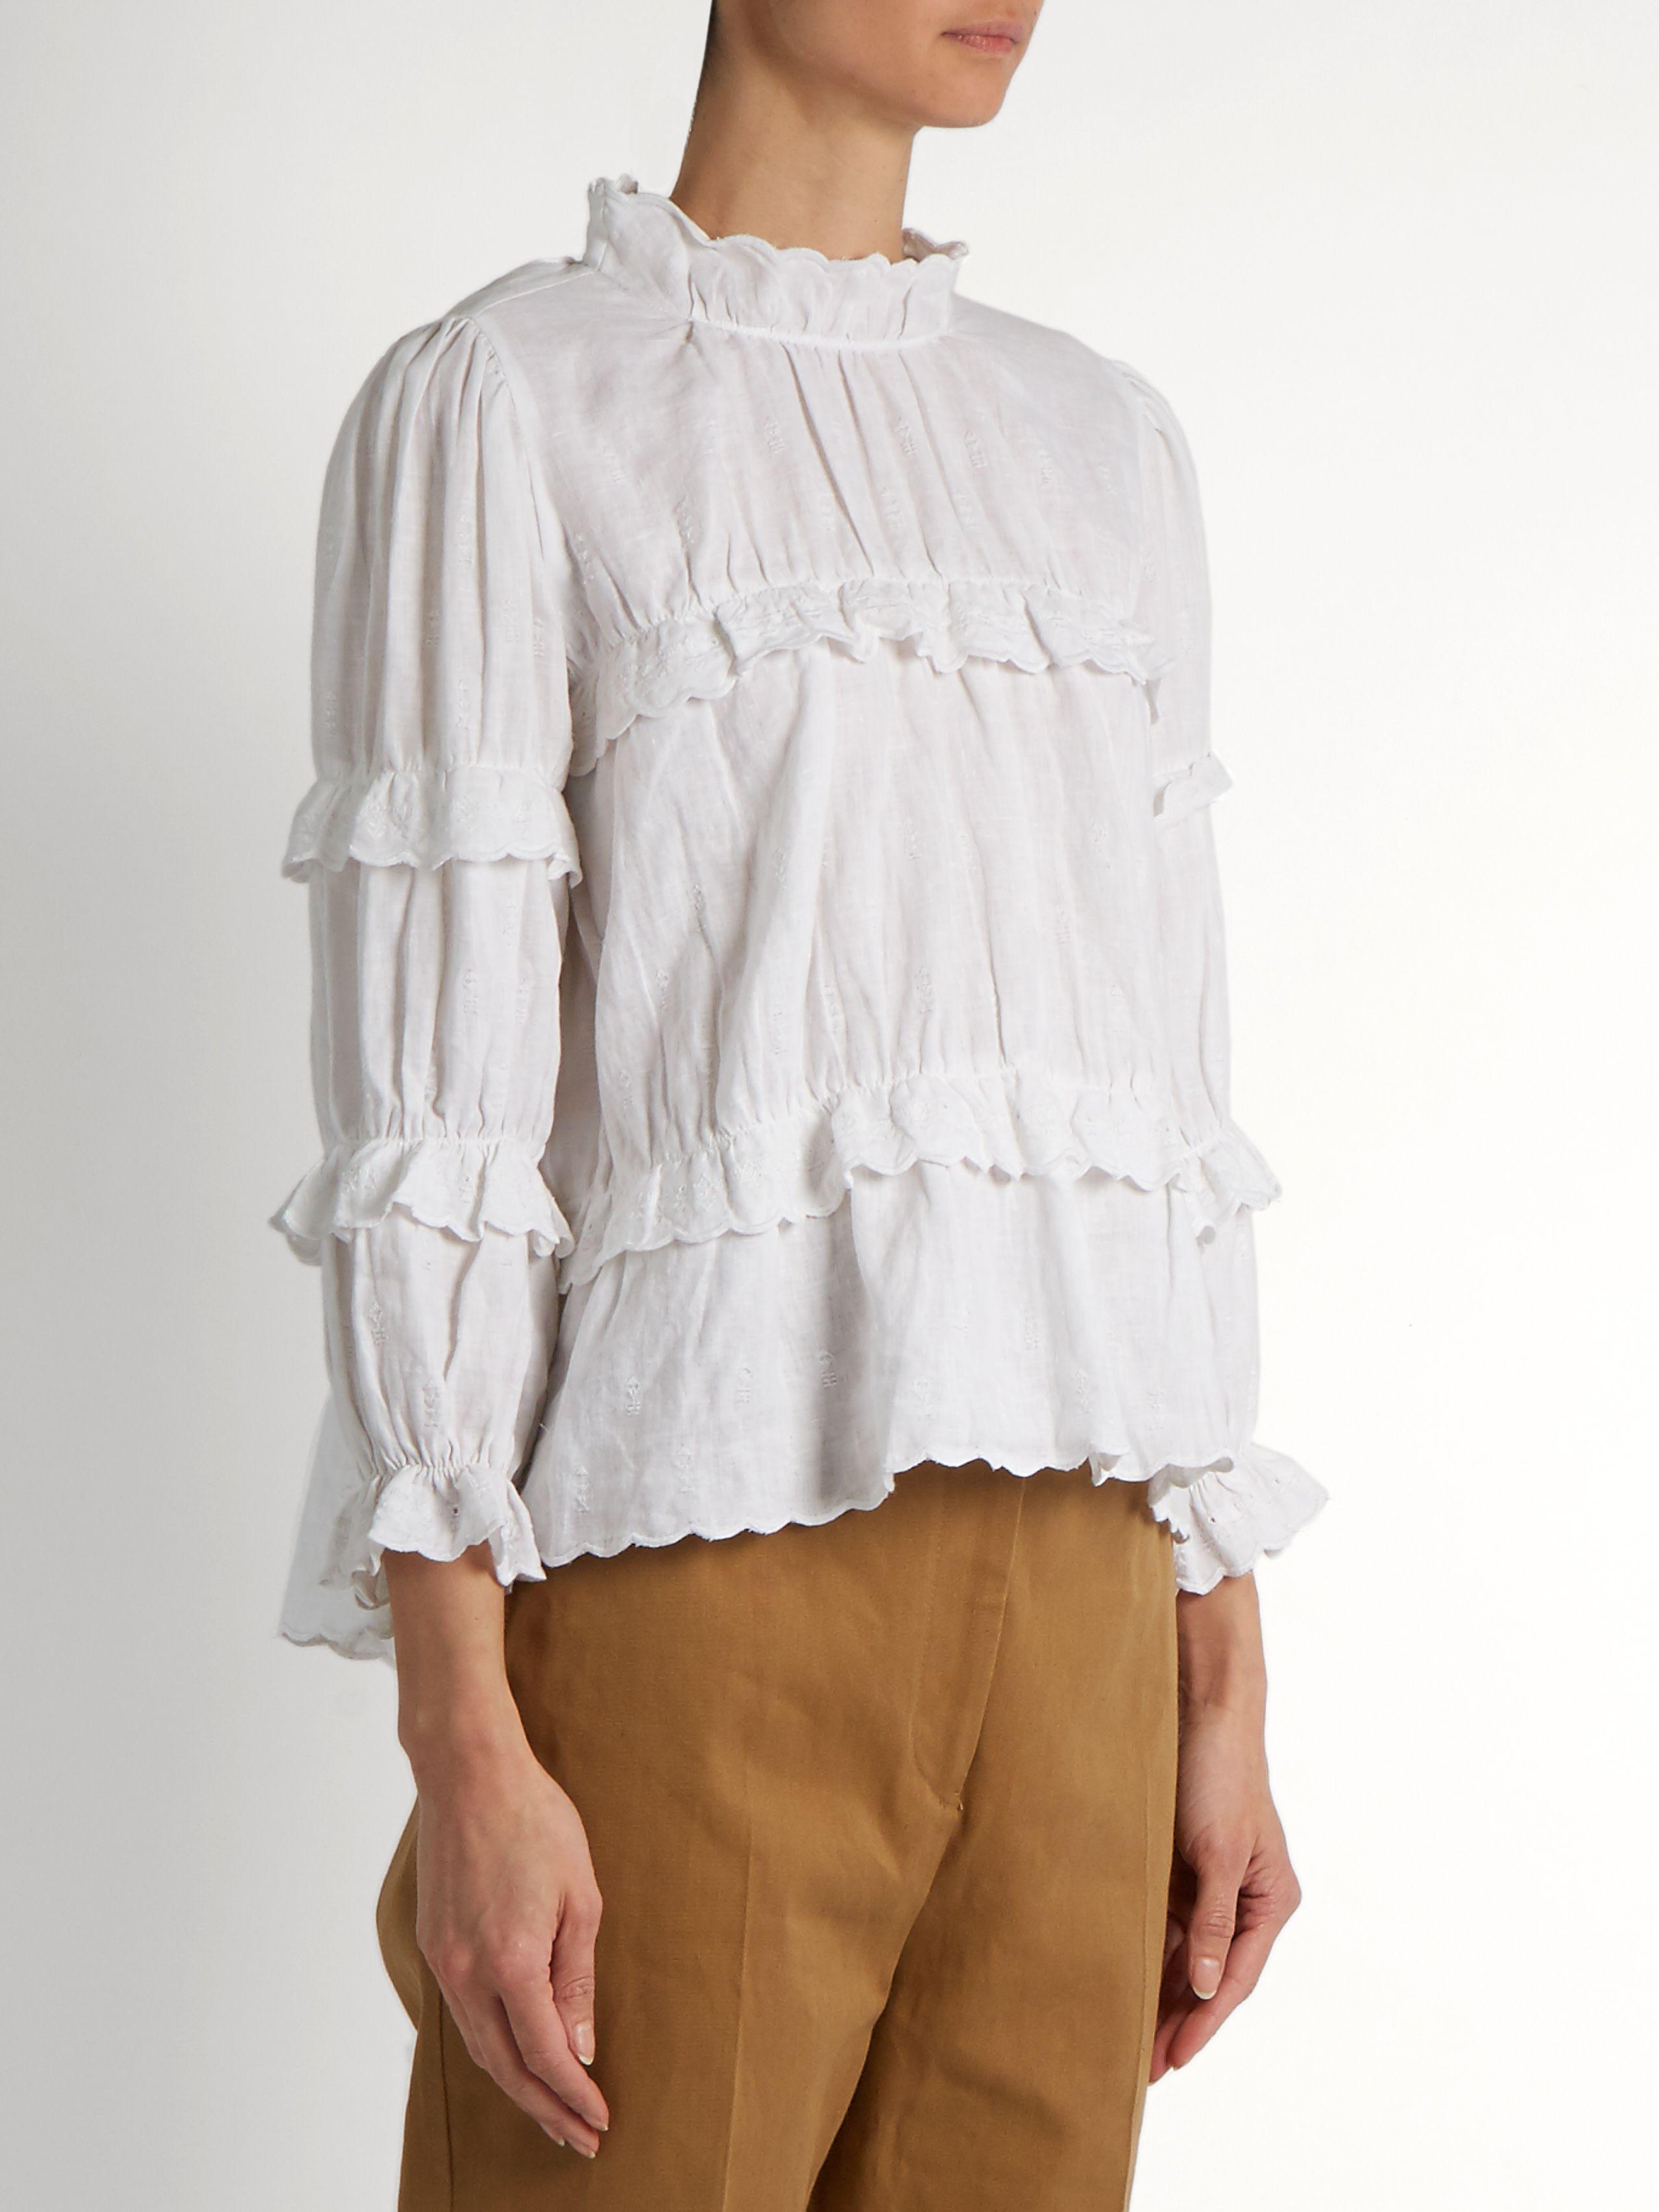 Buy Best New Isabel Marant Étoile ruffled blouse vWrnSh